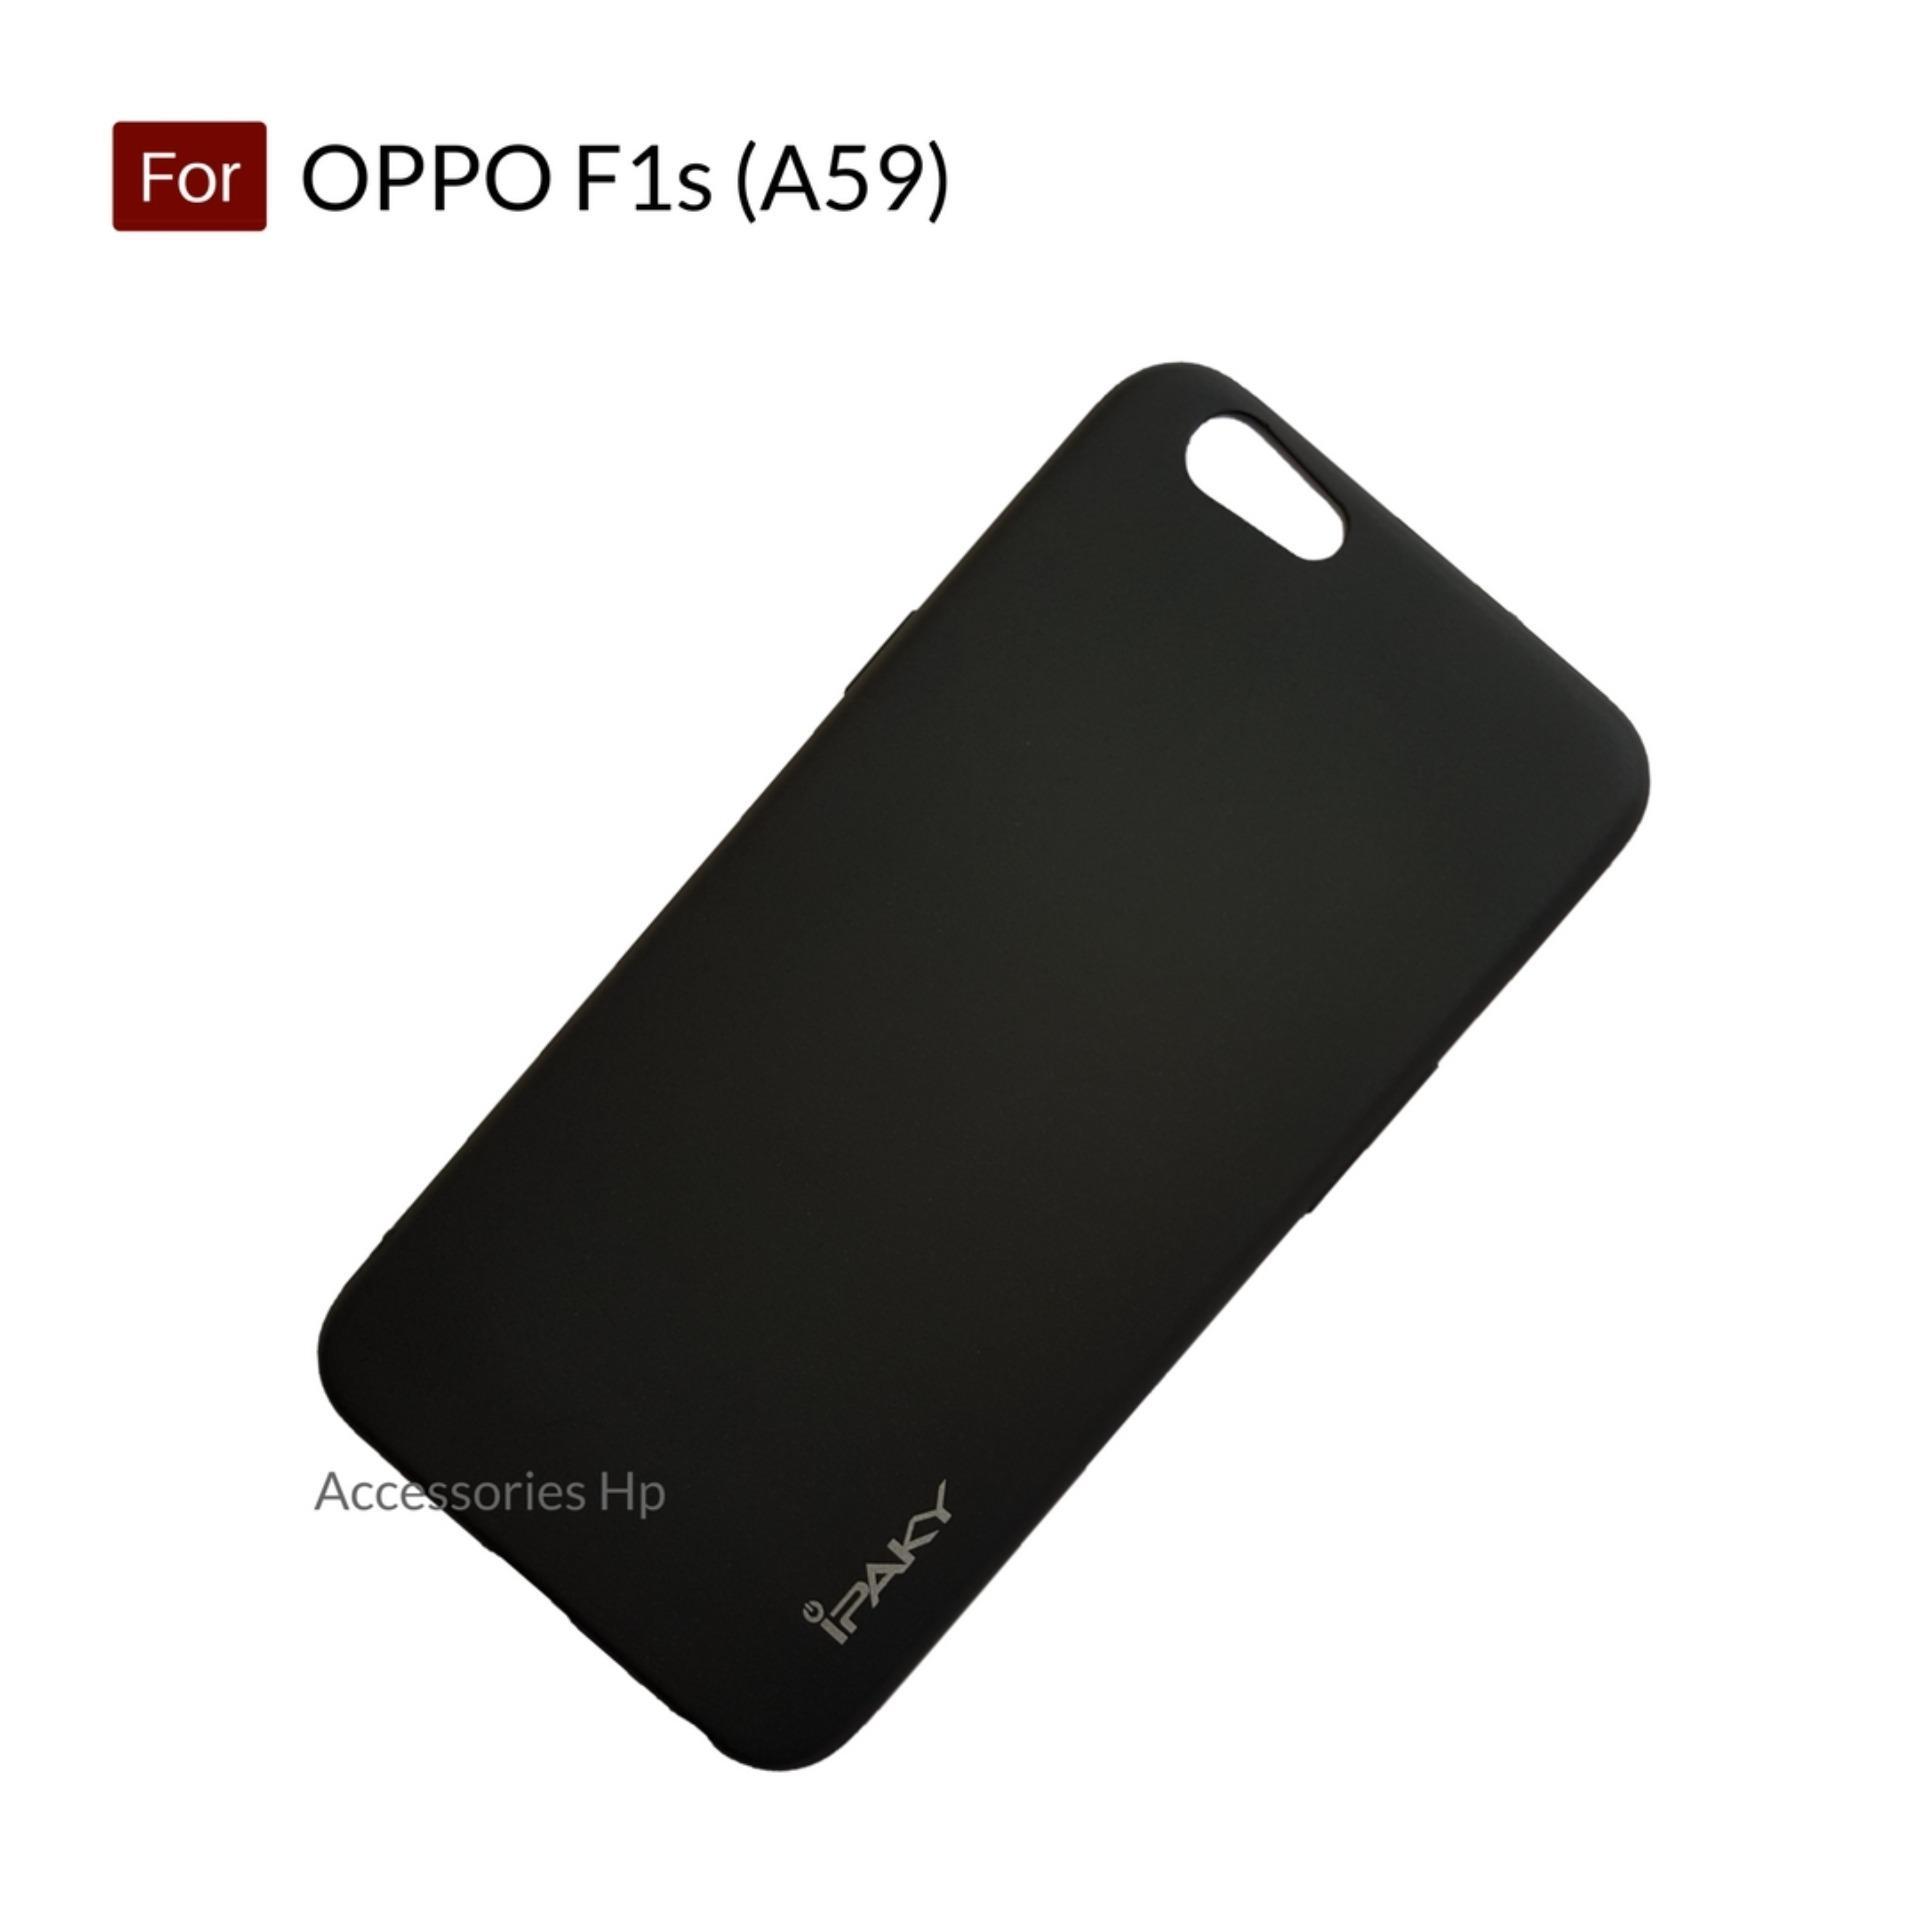 Accessories Hp iPaky Super Slim Matte Anti Fingerprint Hybrid Case For OPPO F1s A59